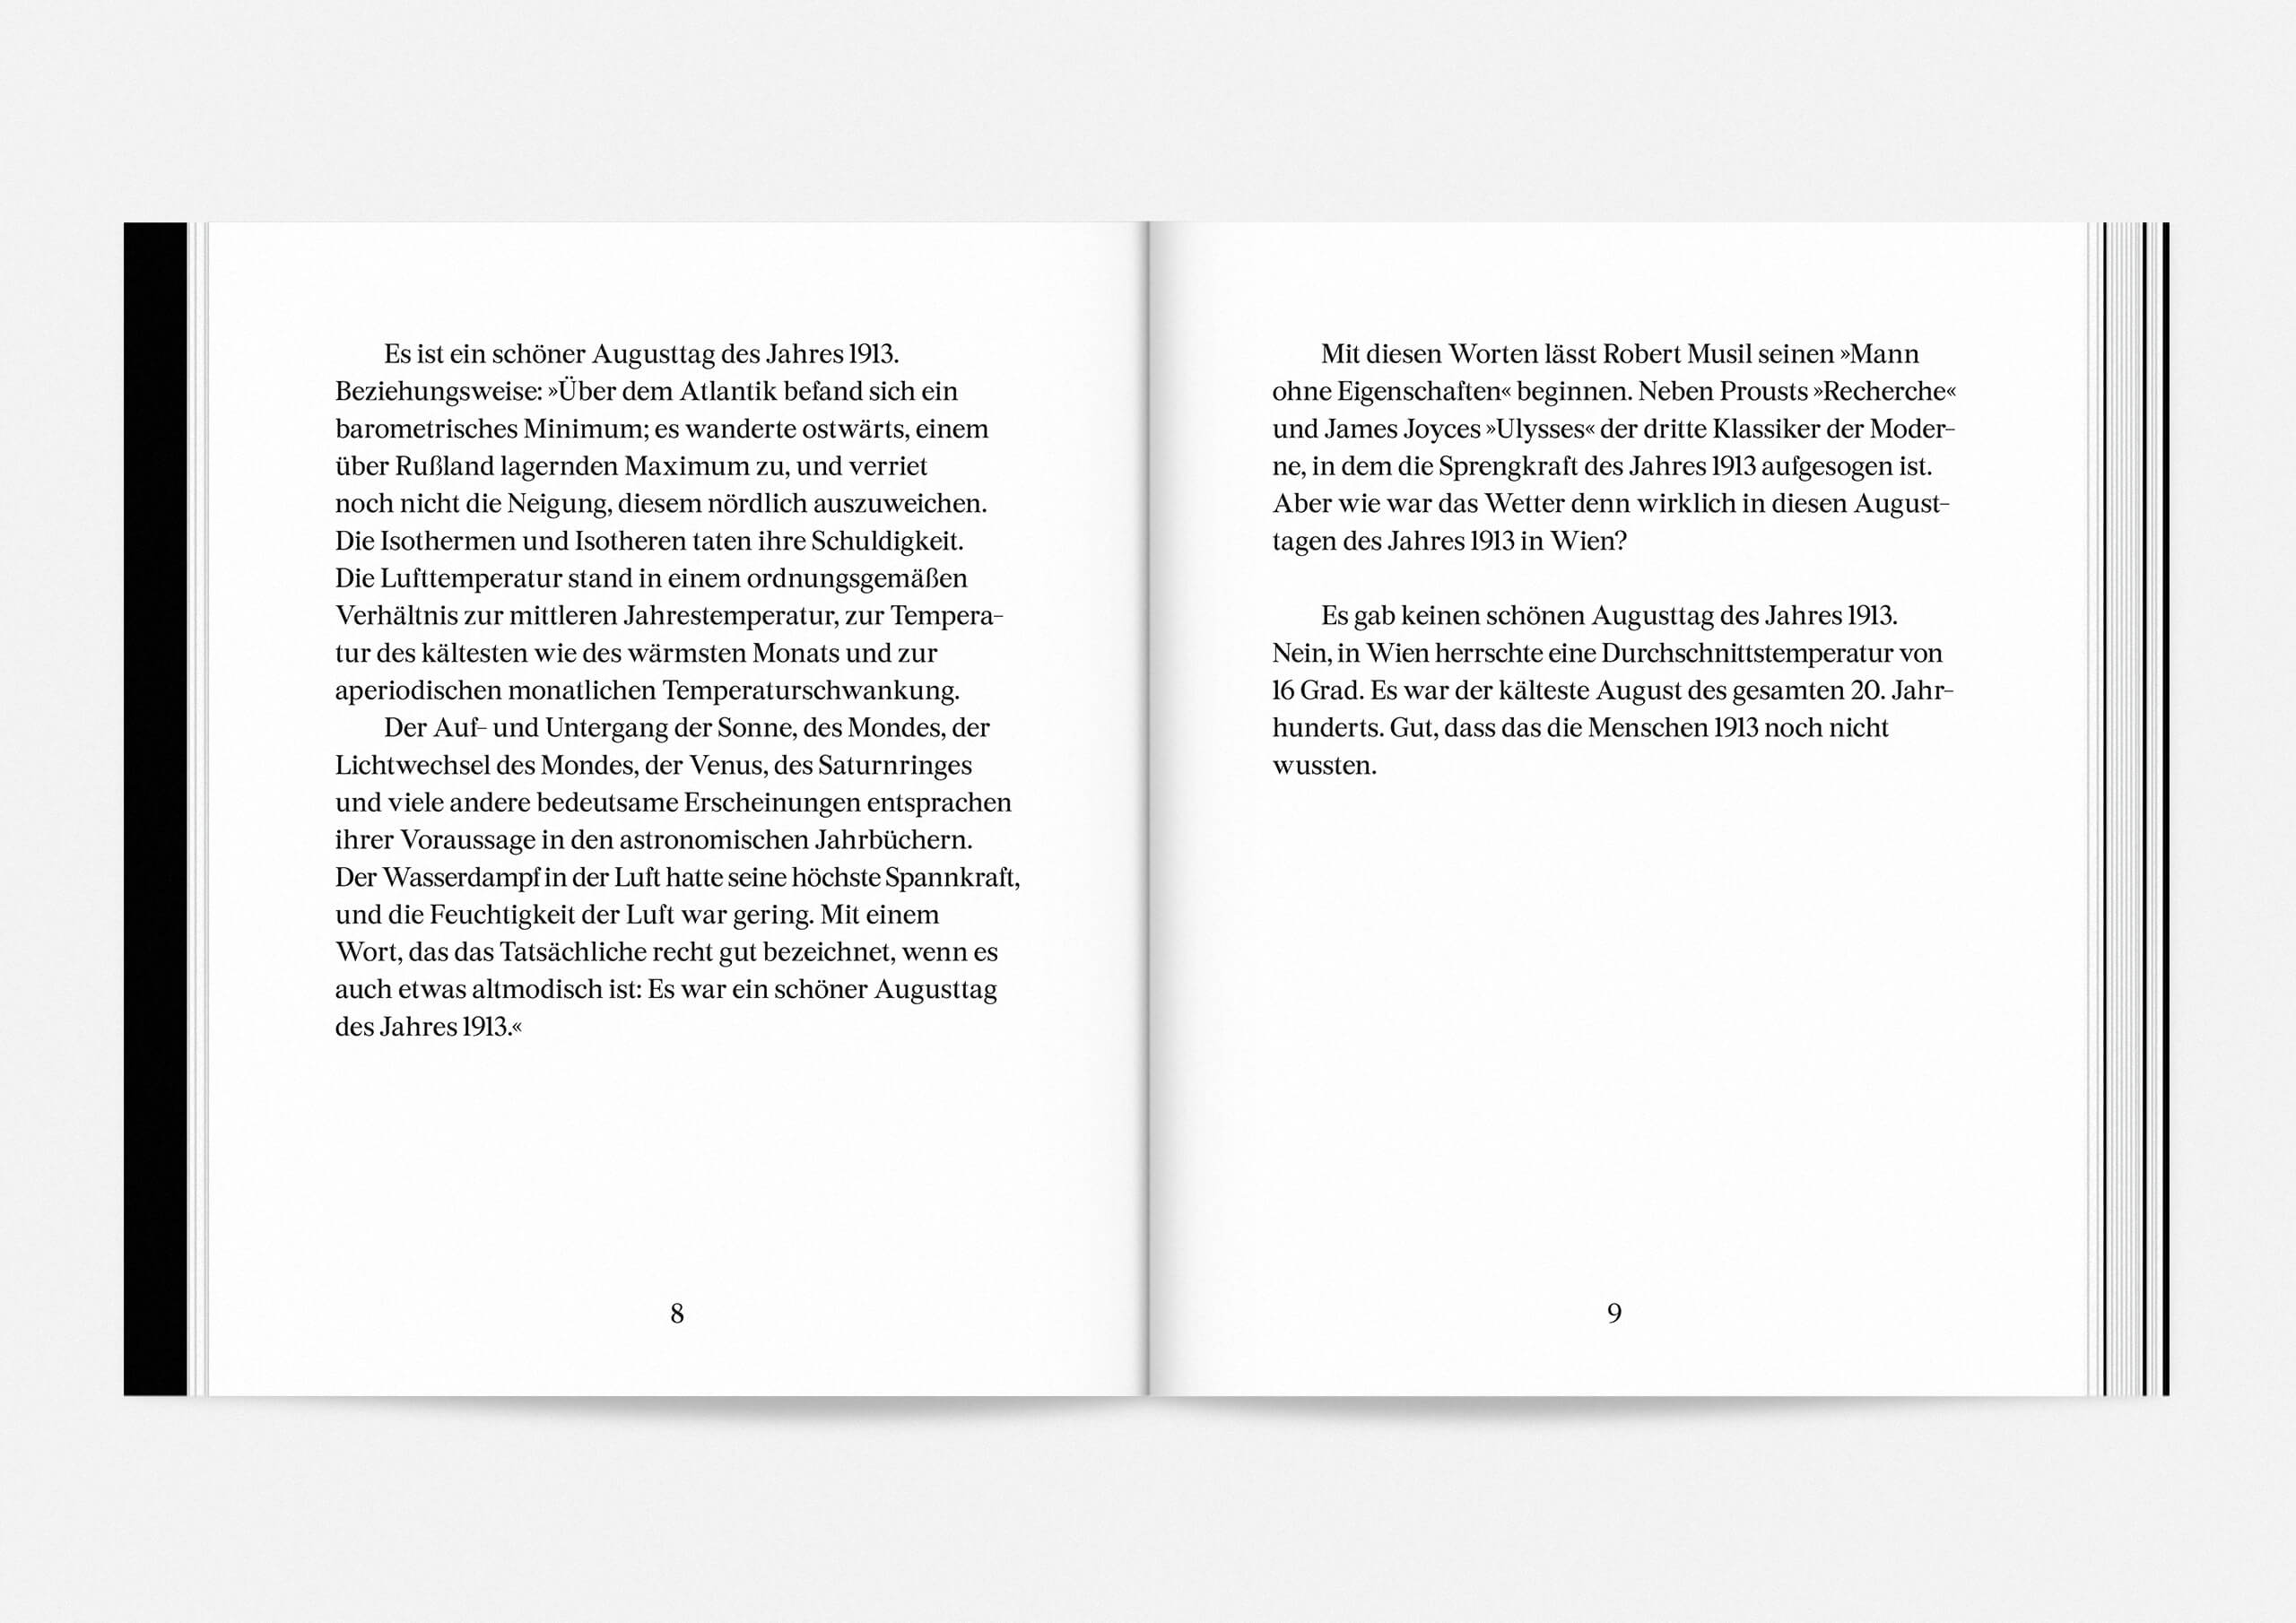 https://neuegestaltung.de/media/pages/clients/andreas-muhe-pathos-als-distanz/b4e5112c73-1597415200/am_dth_ng-web_s.08-09.jpg